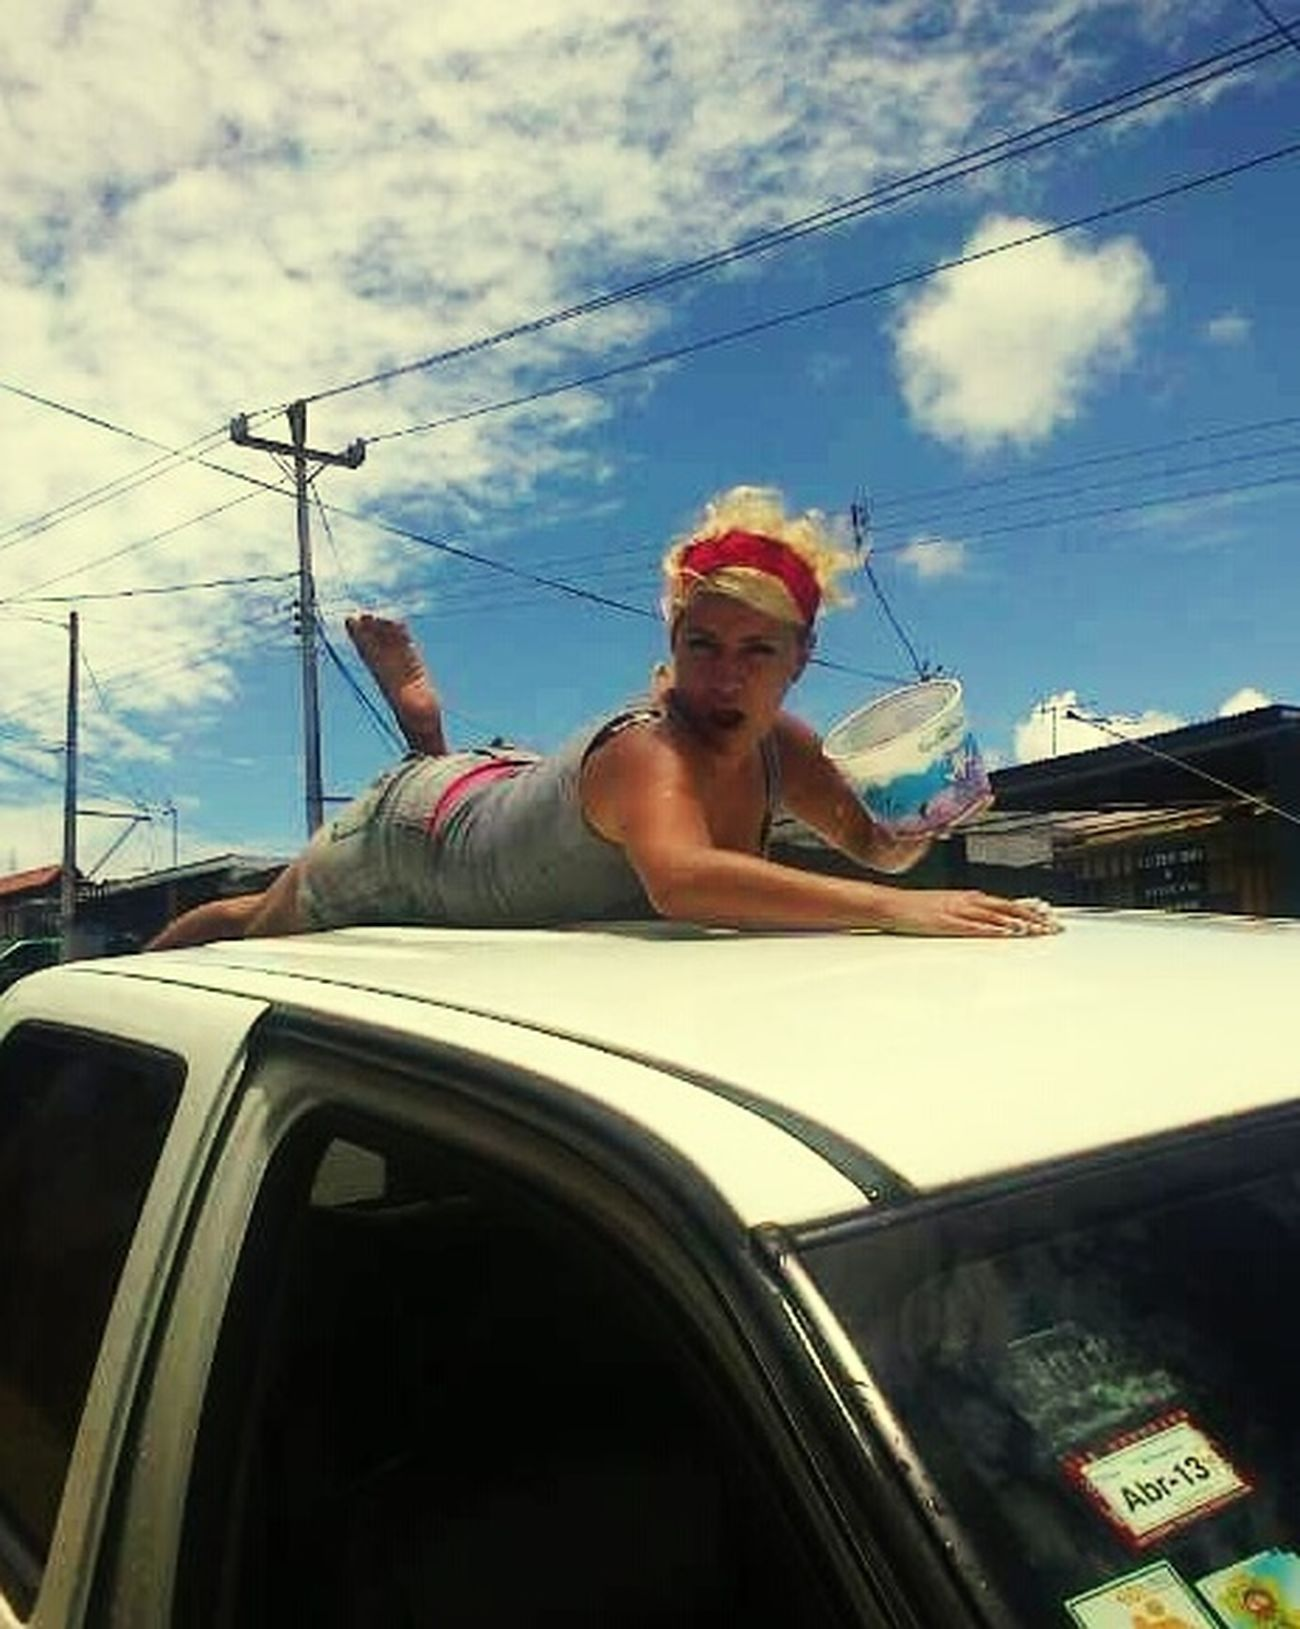 CarWashTime PinUpGirl Enjoying Life Makingfun Camaleon